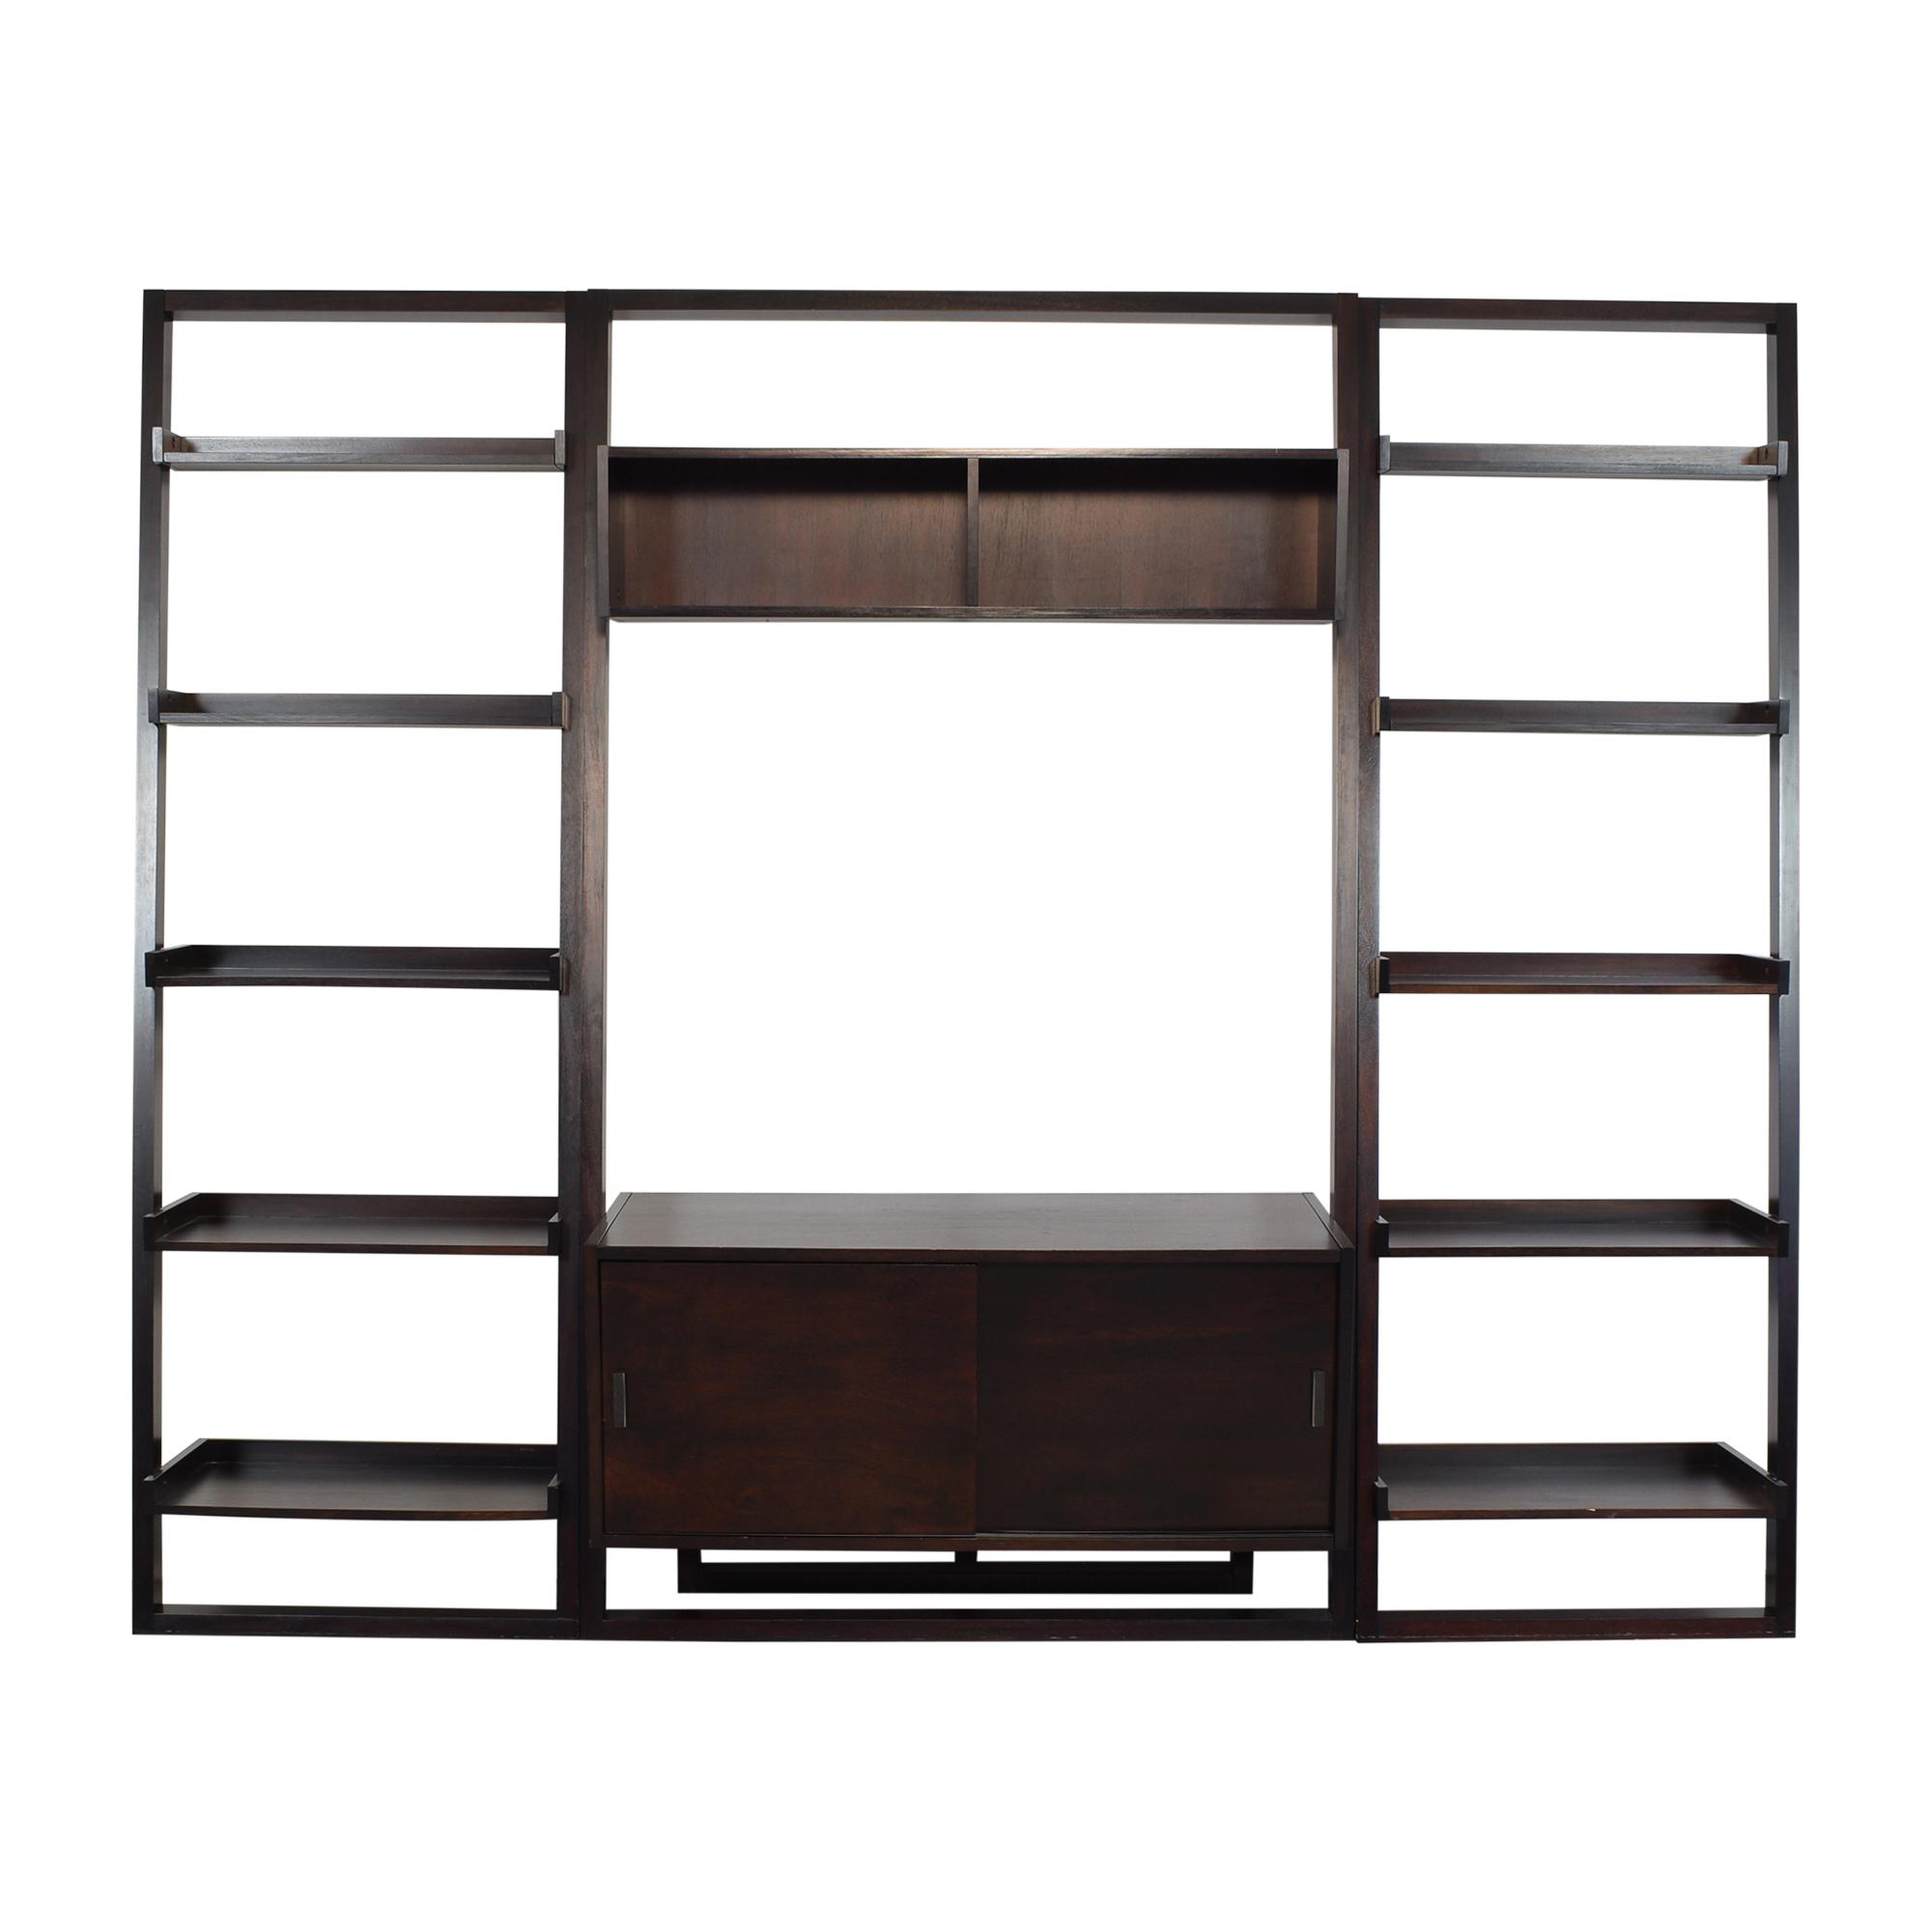 Crate & Barrel Crate & Barrel Sloane Media Center Bookcases & Shelving